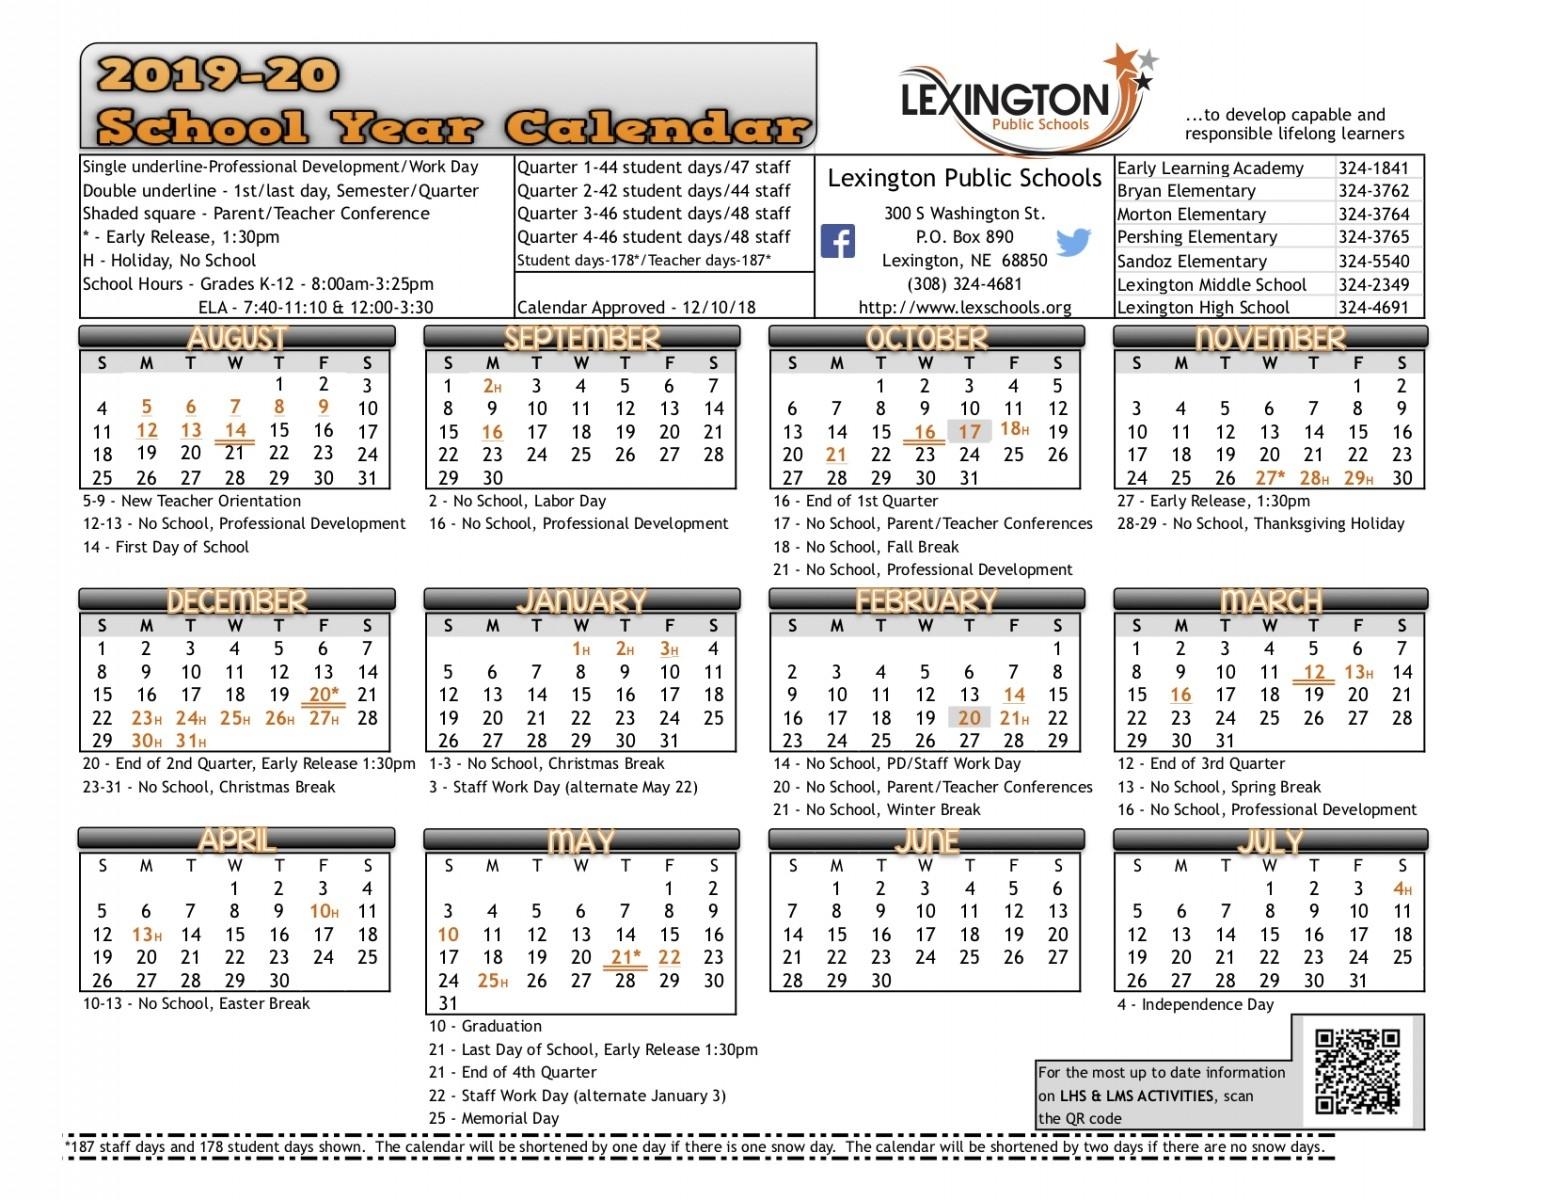 School Year Calendar - Lexington Public Schools Lexington 1 School Calendar